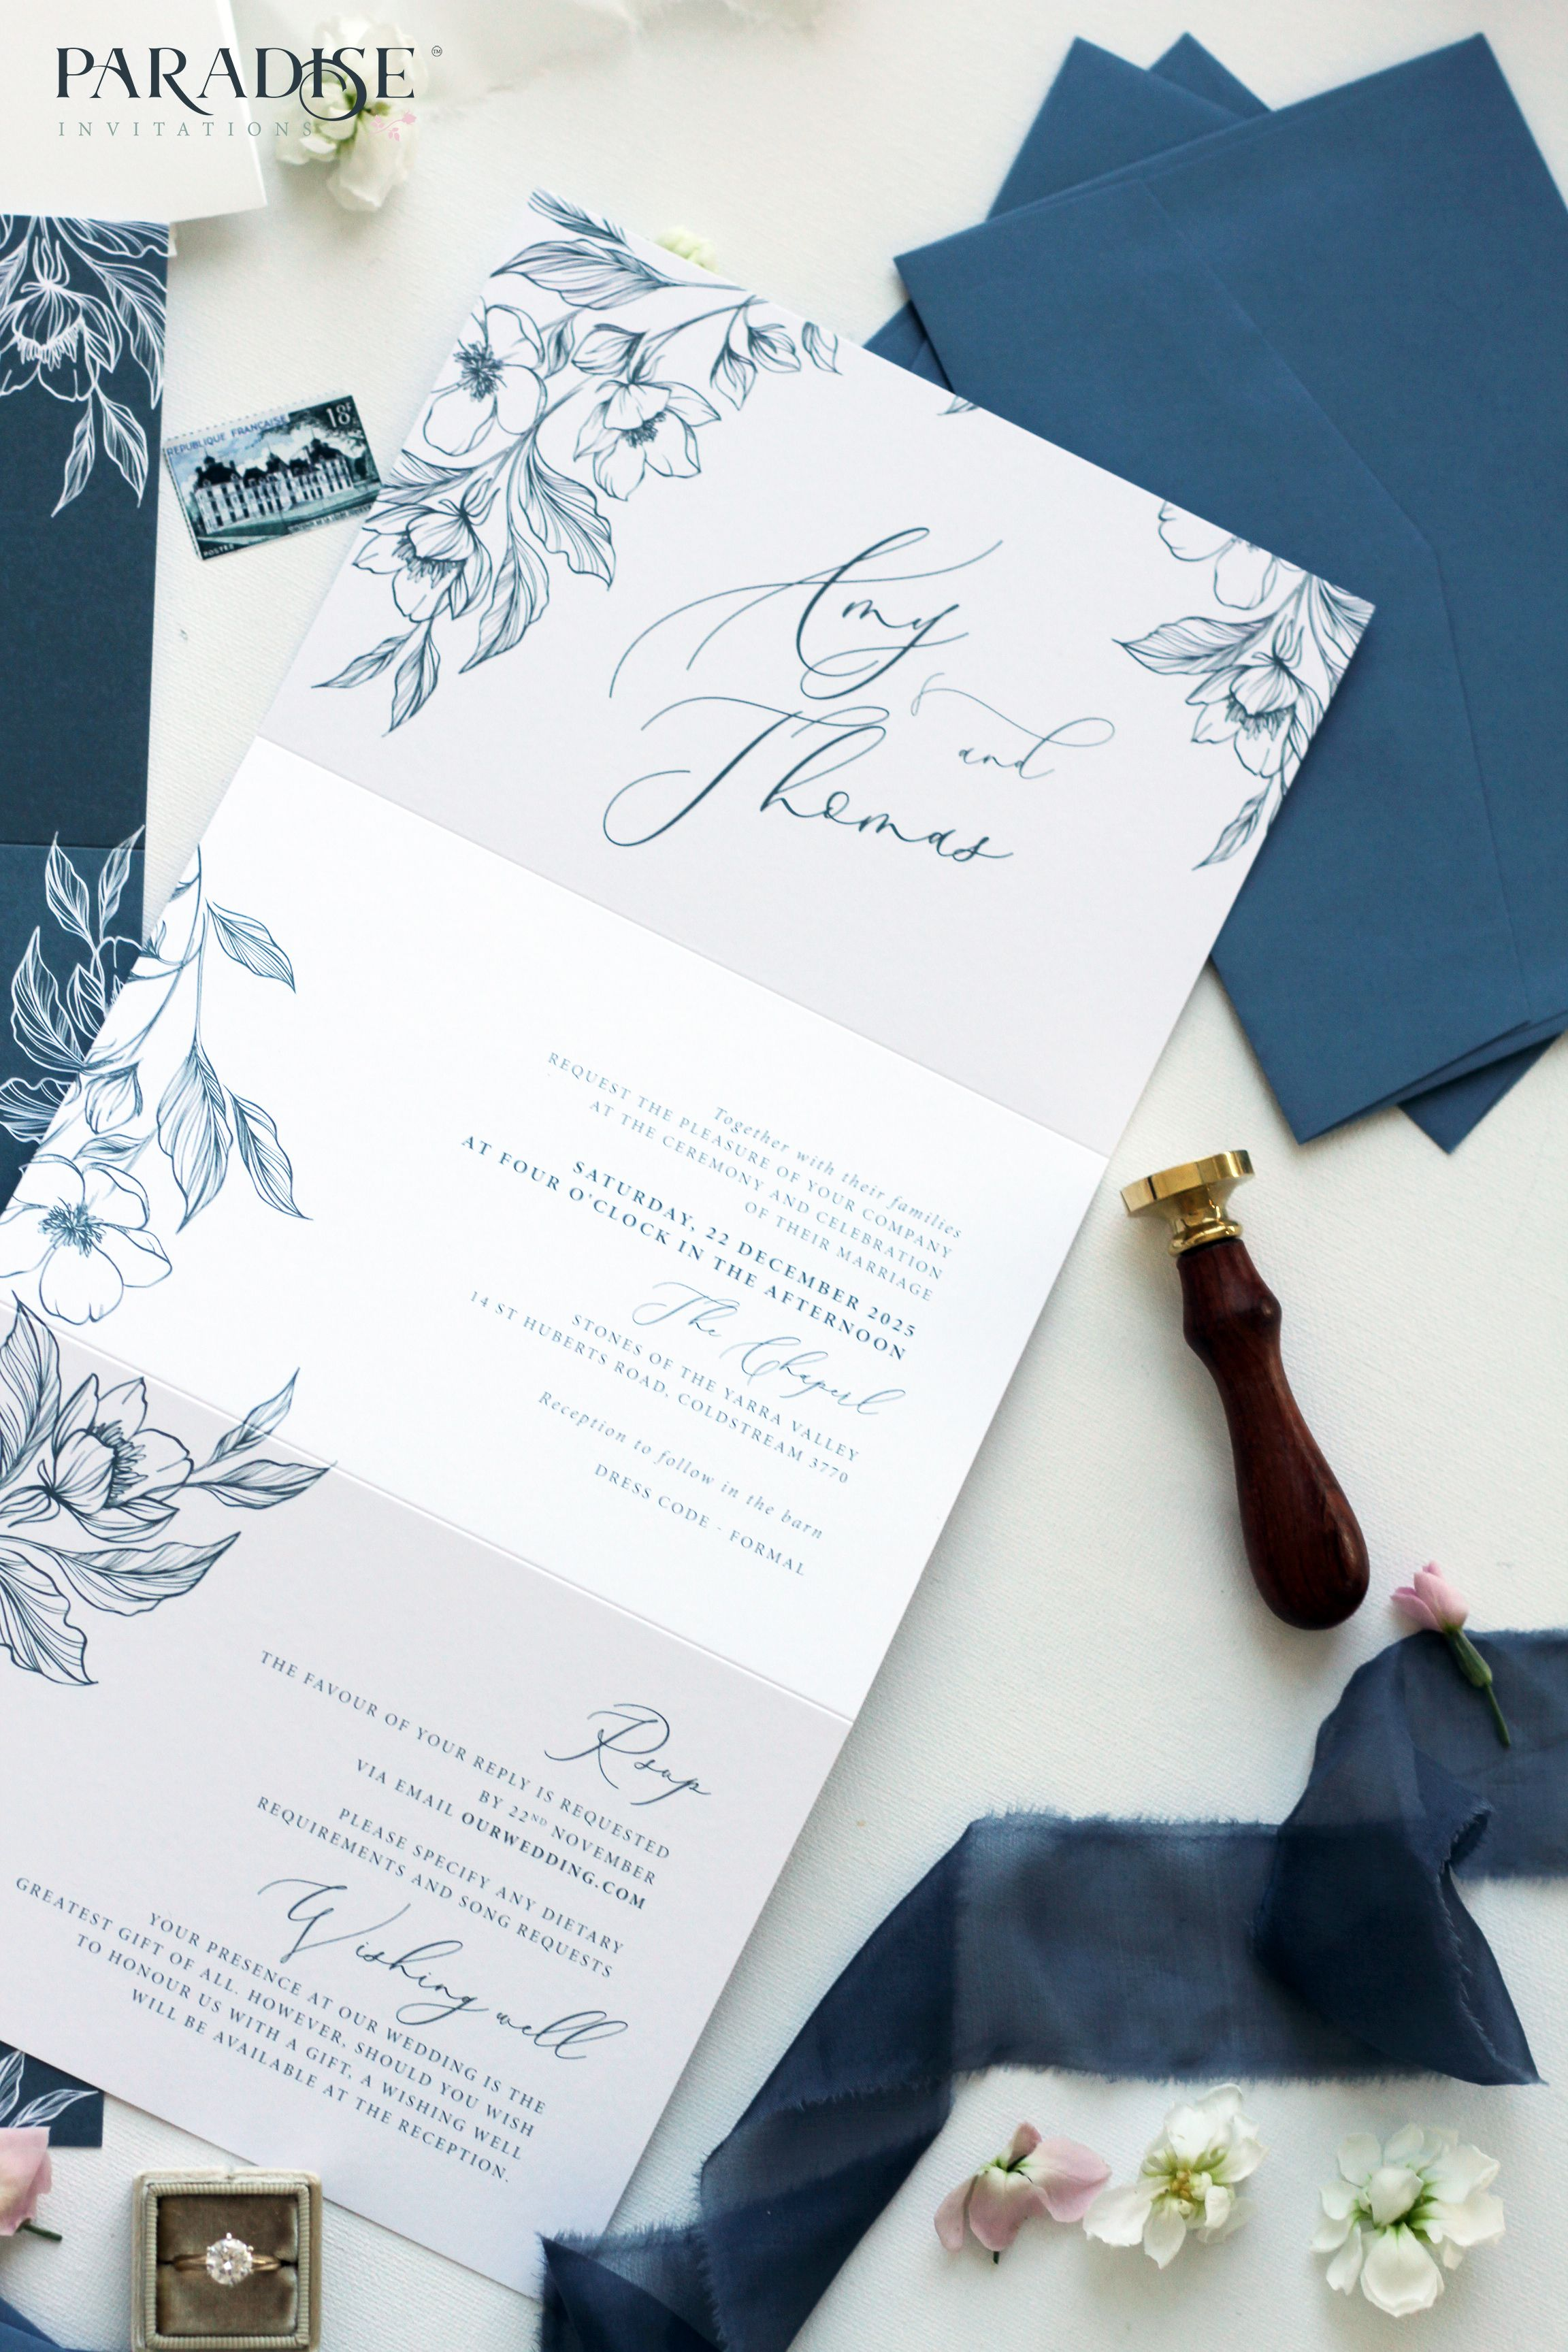 Pin By Natali Capitani On Dustyblue With Images Tri Fold Wedding Invitations Custom Wedding Cards Wedding Invitations Australia